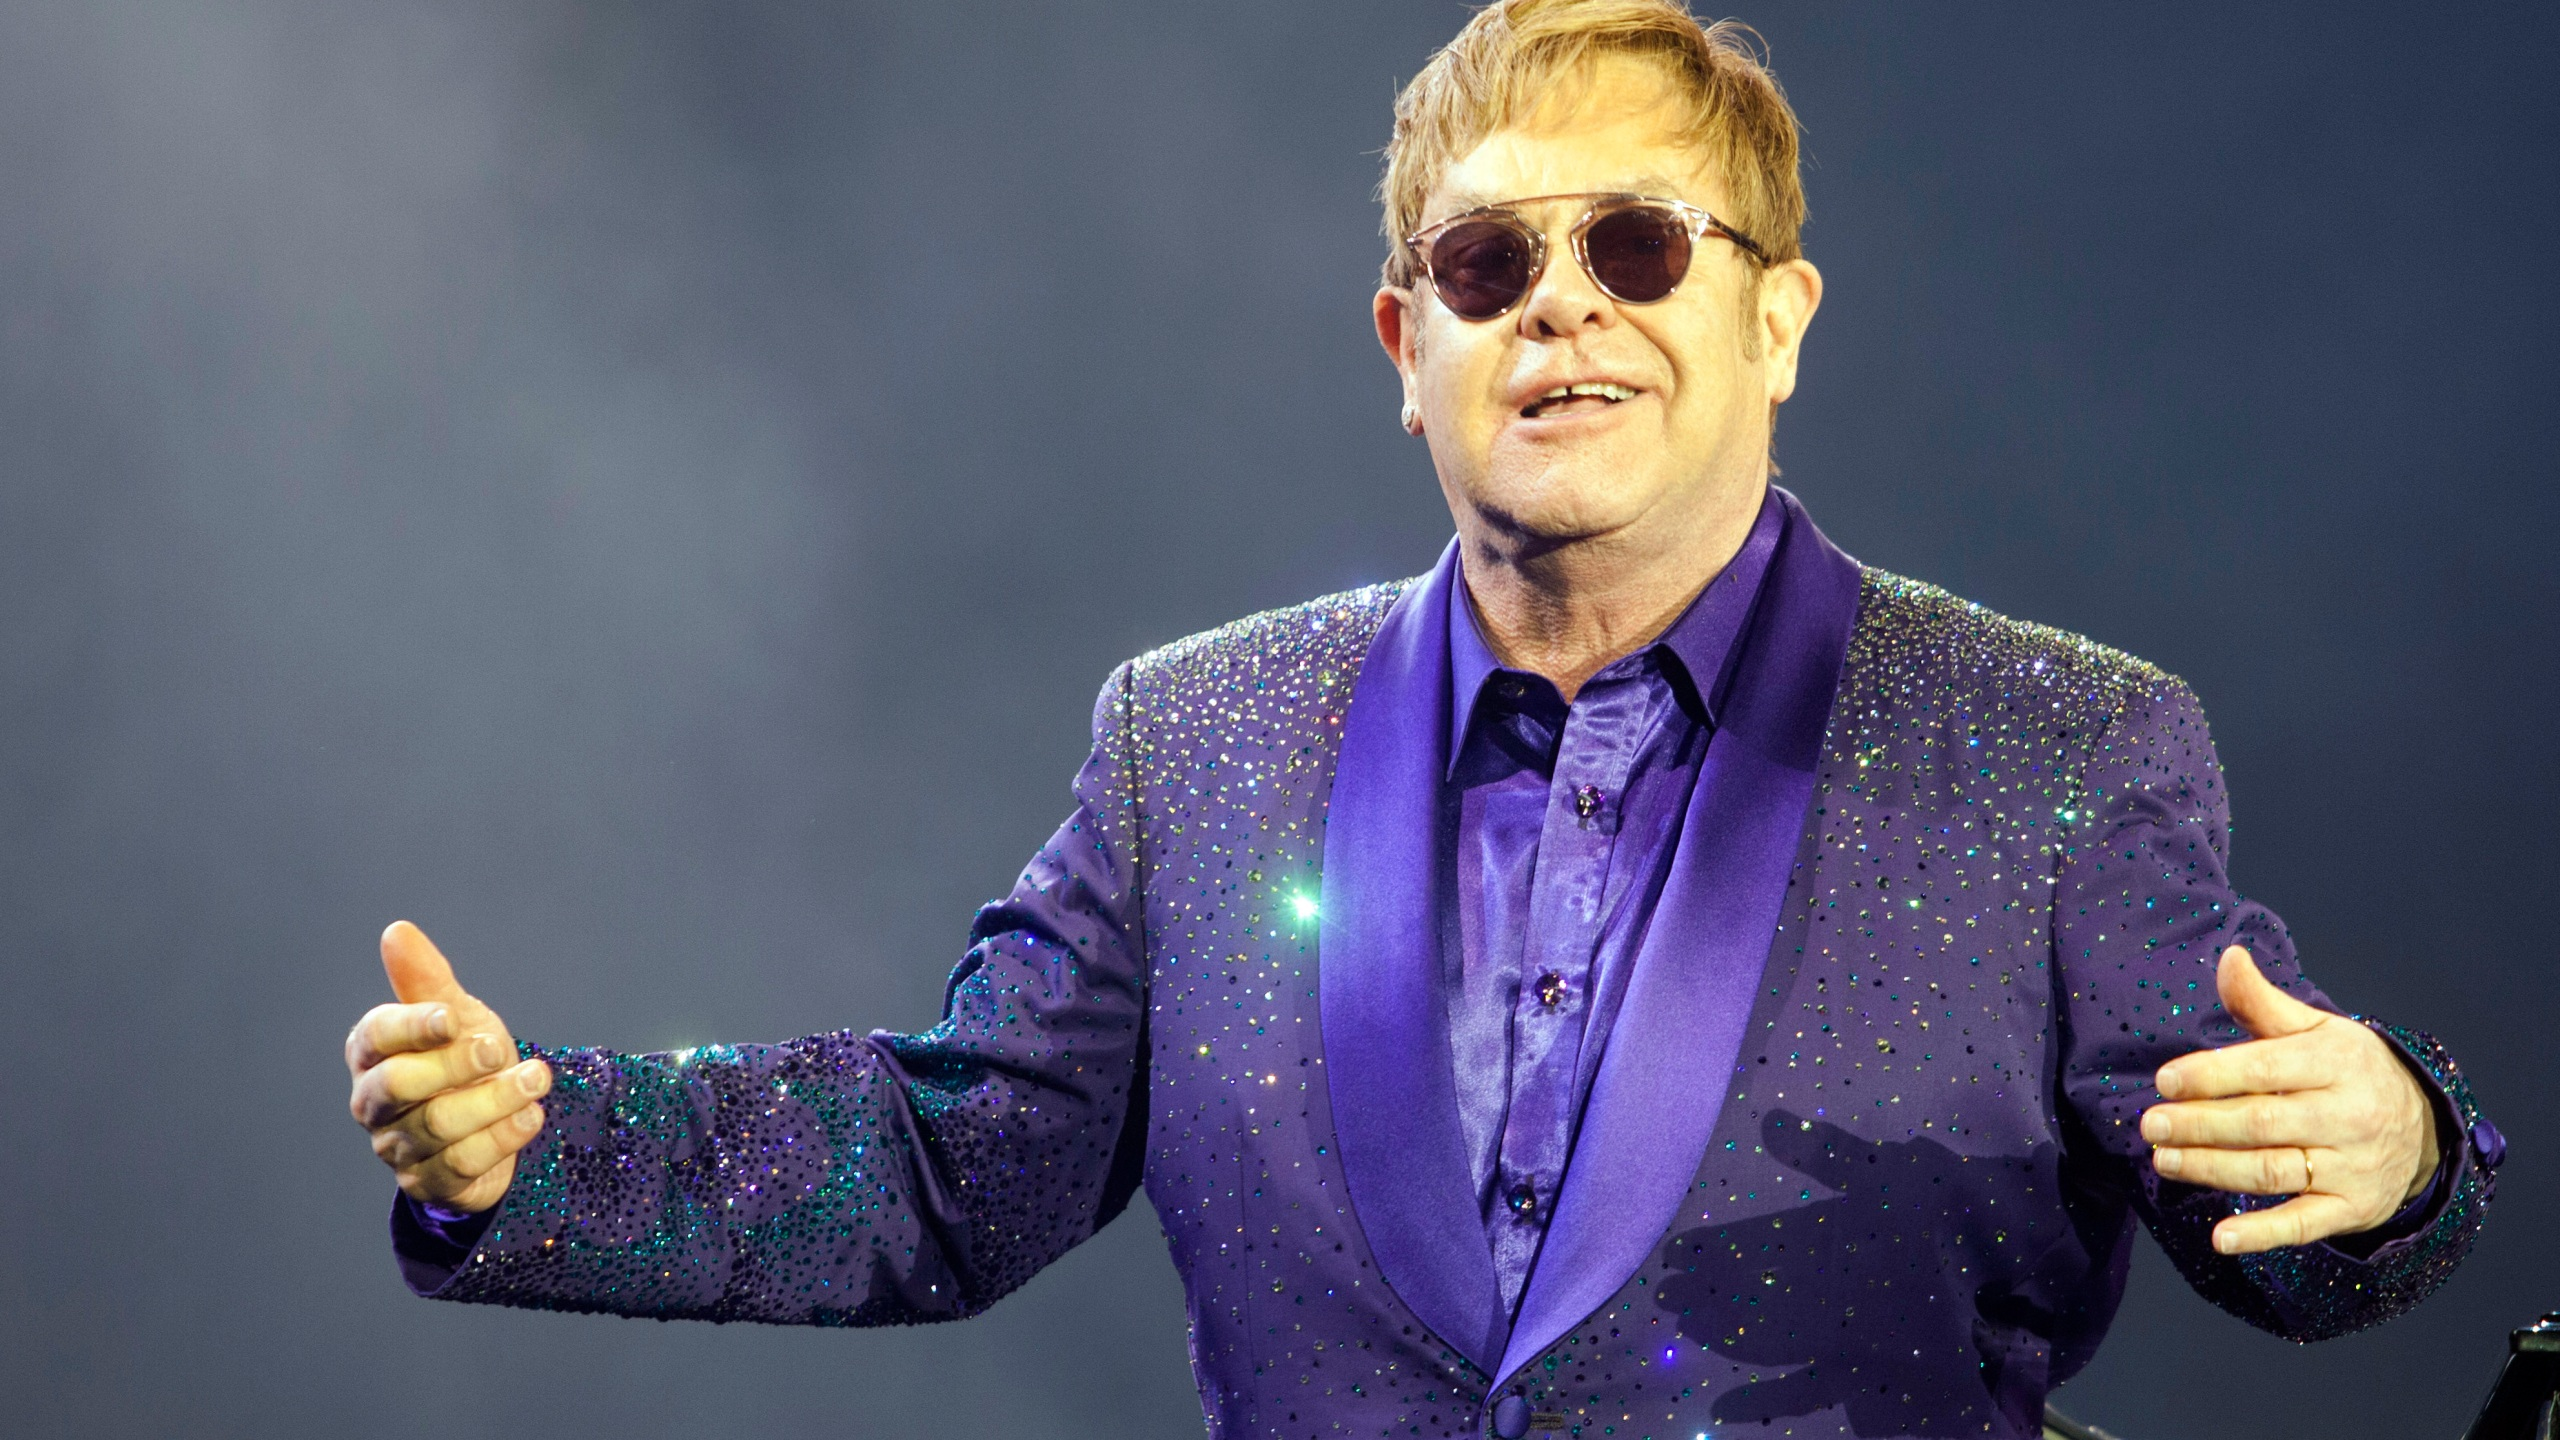 Britain Elton John_228825